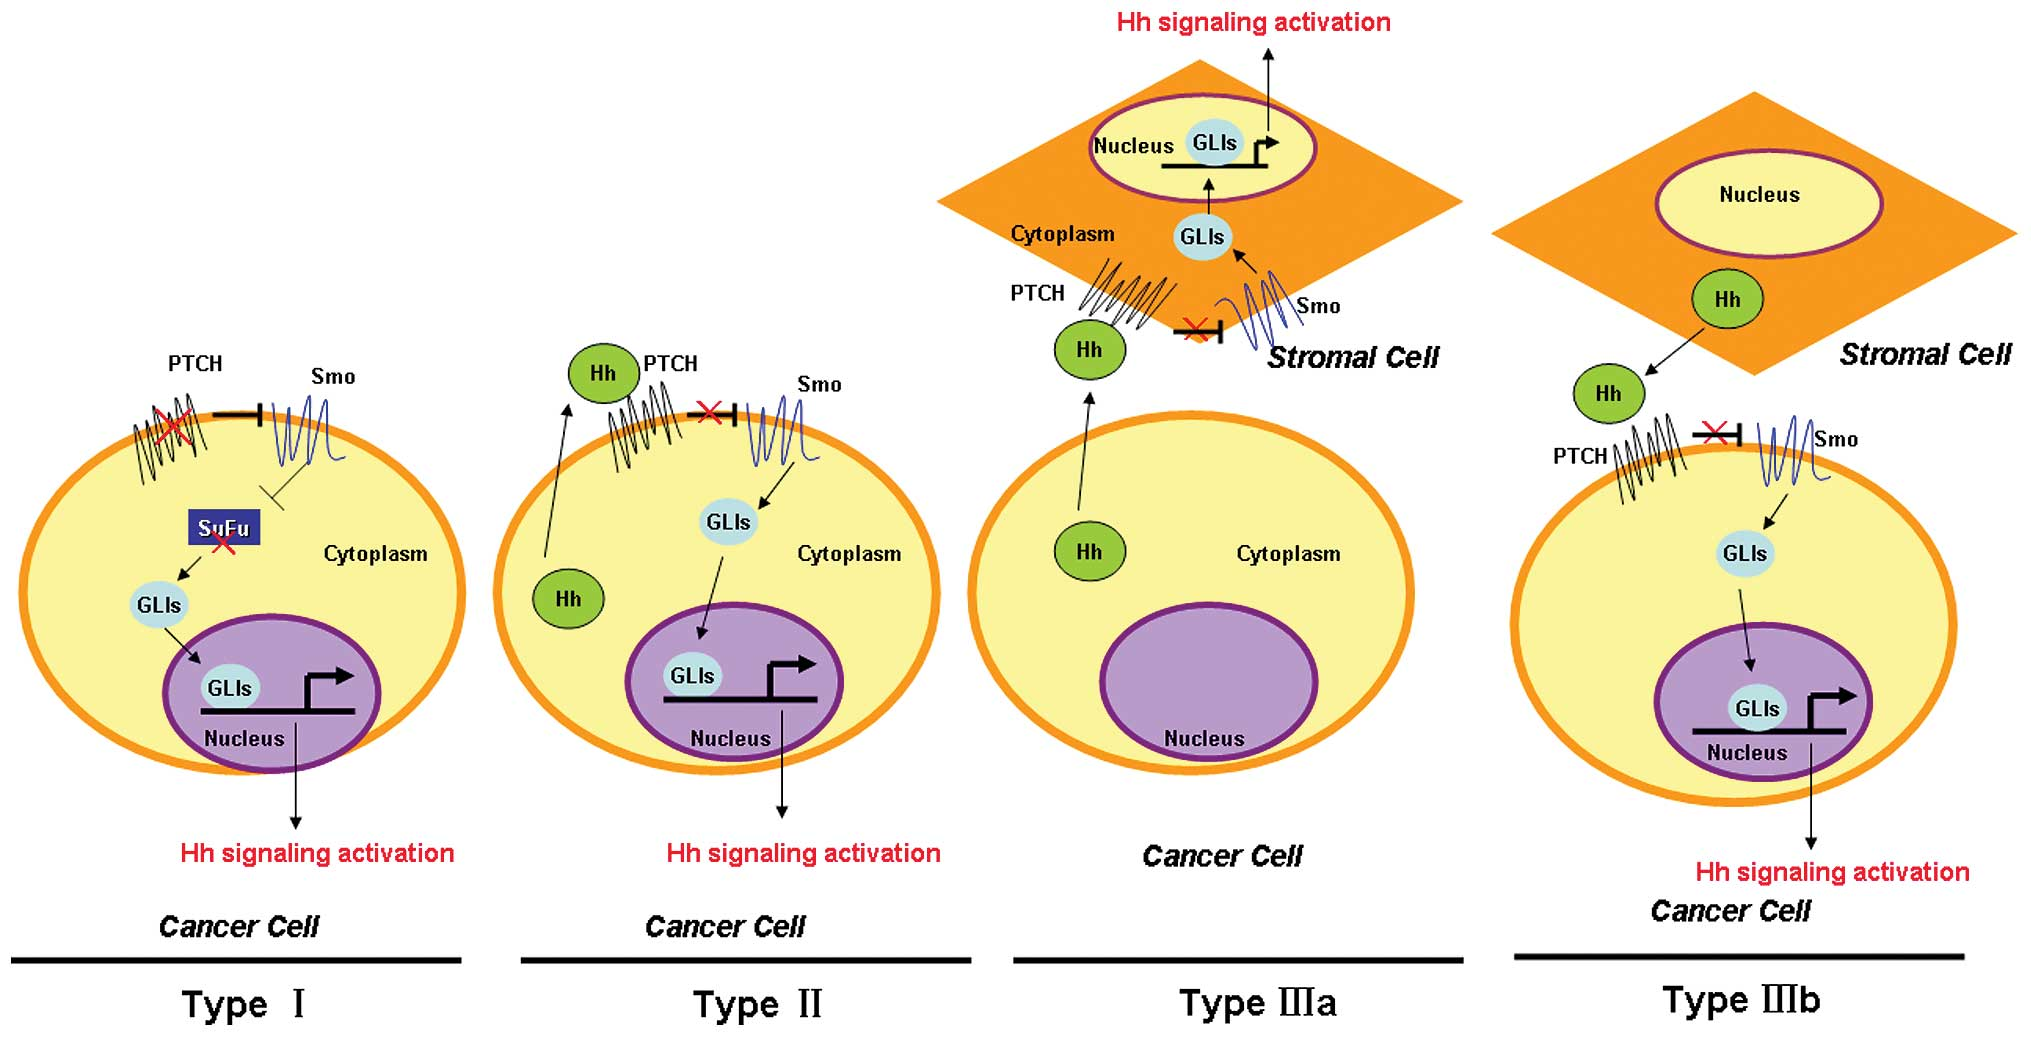 hepatocellular cancer signalling pathway)